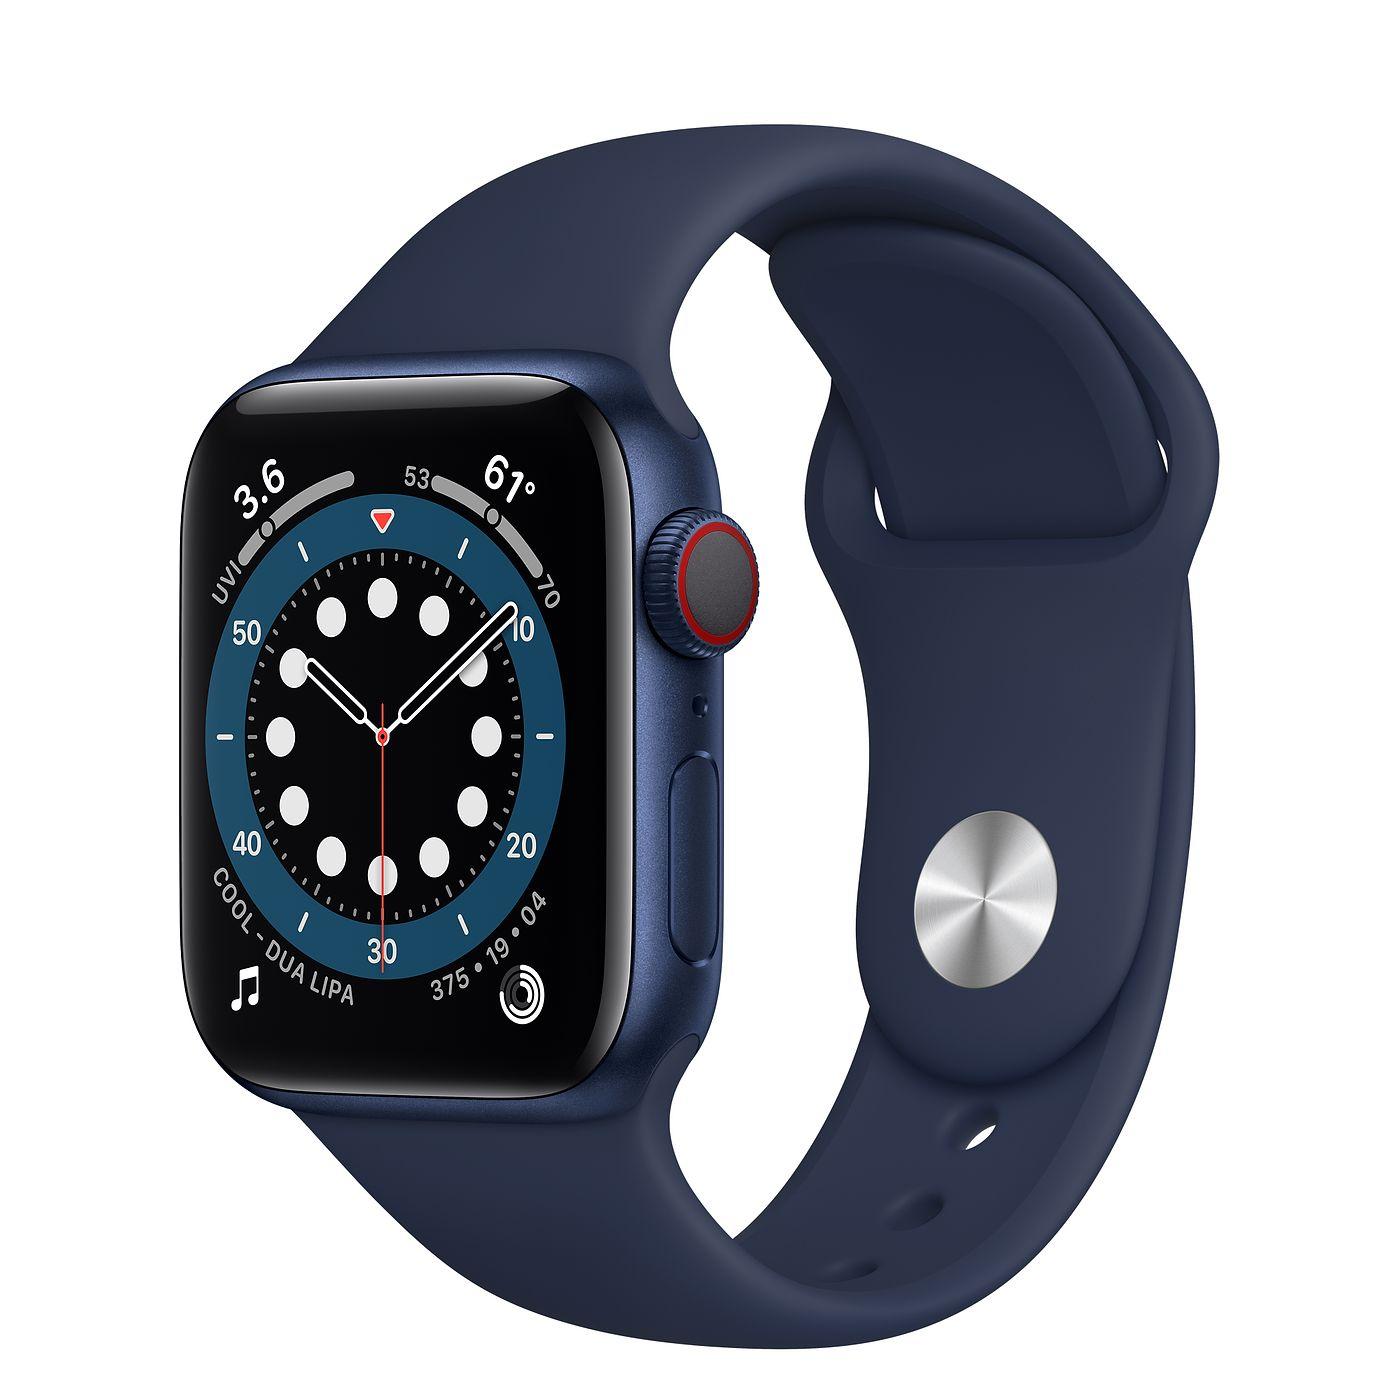 Apple 2020년 애플워치 6 GPS + 셀룰러 40mm 레귤러, 블루 알루미늄(케이스), 딥네이비(스포츠 밴드)